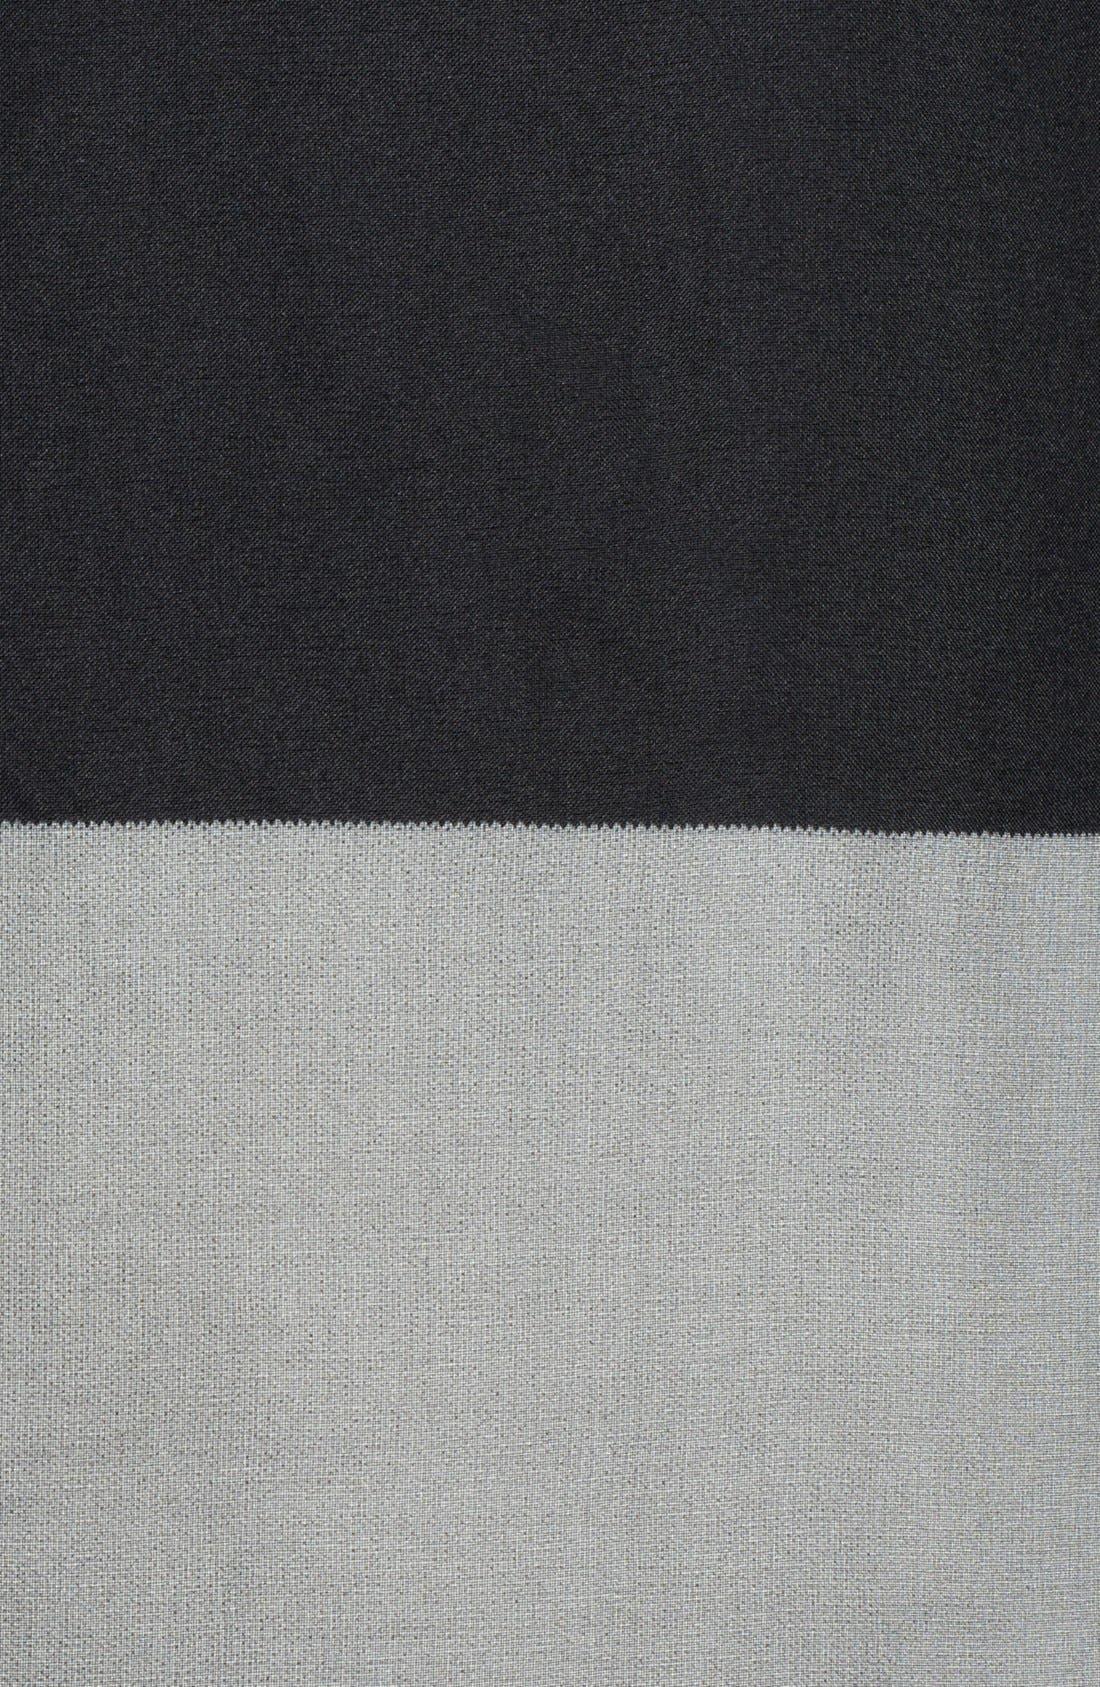 Alternate Image 3  - T by Alexander Wang Organza Overlay Stripe T-Shirt Dress